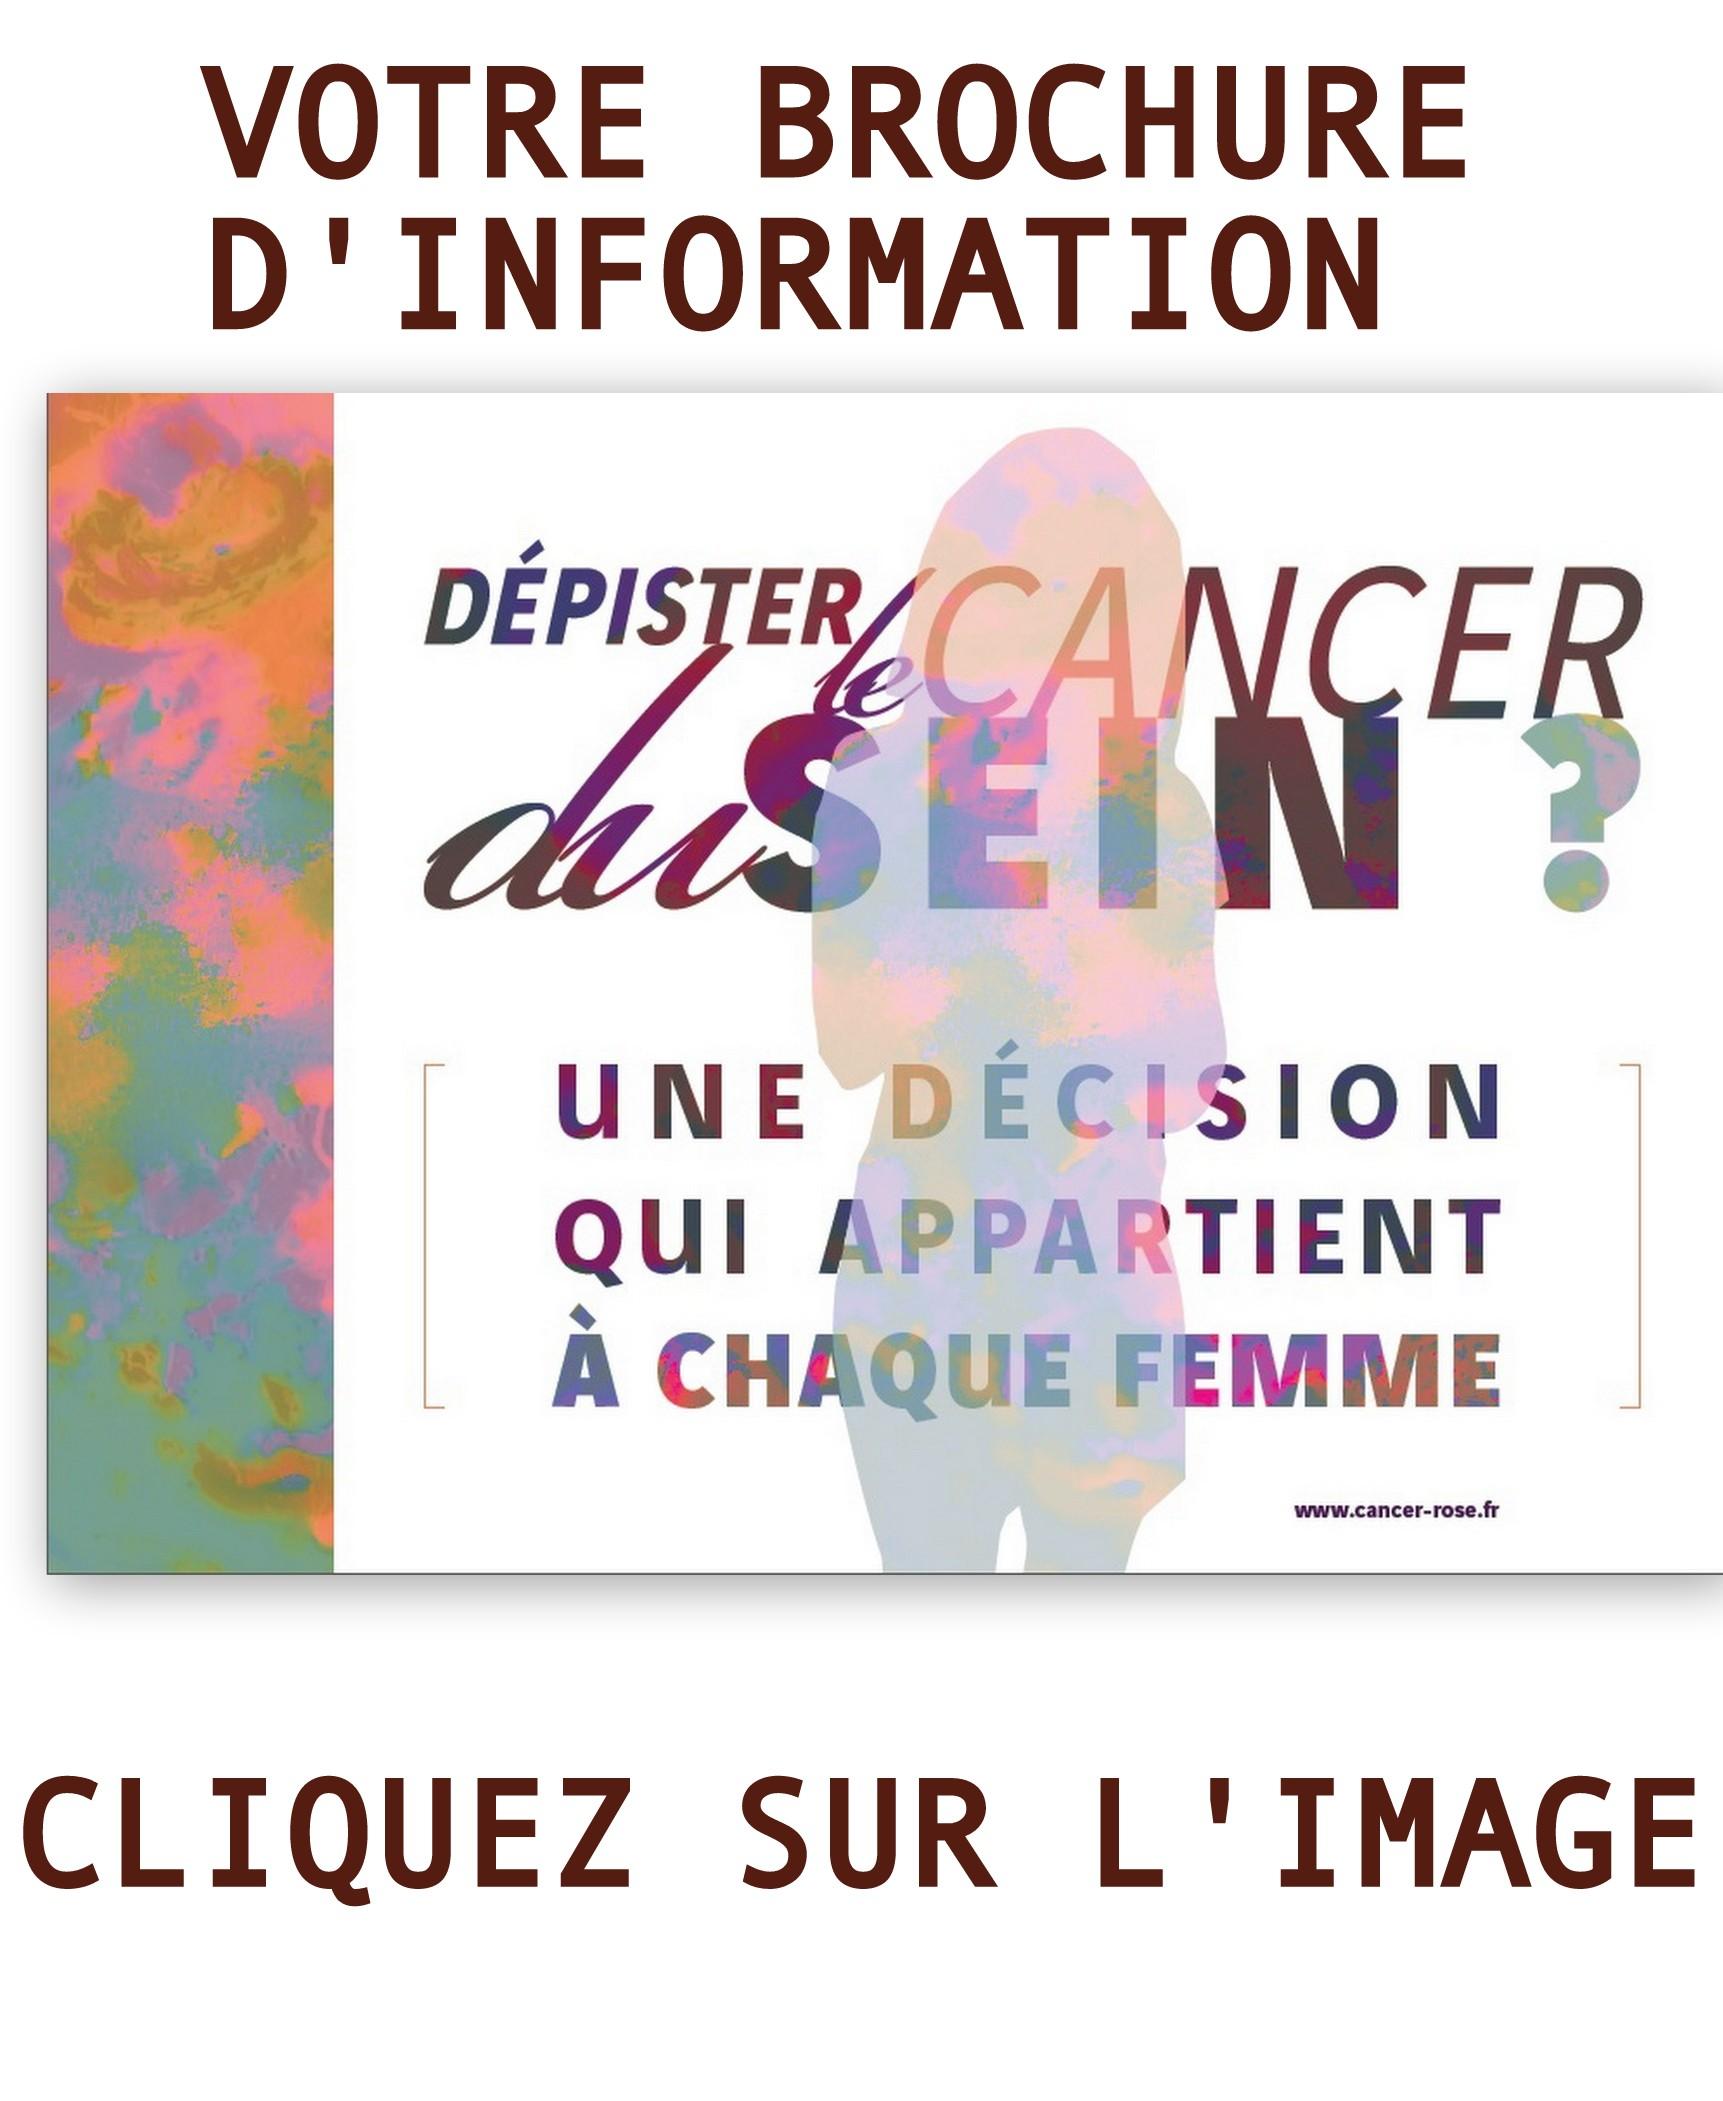 2015-10-28-1446036041-301026-BrochureCancerRose.jpg